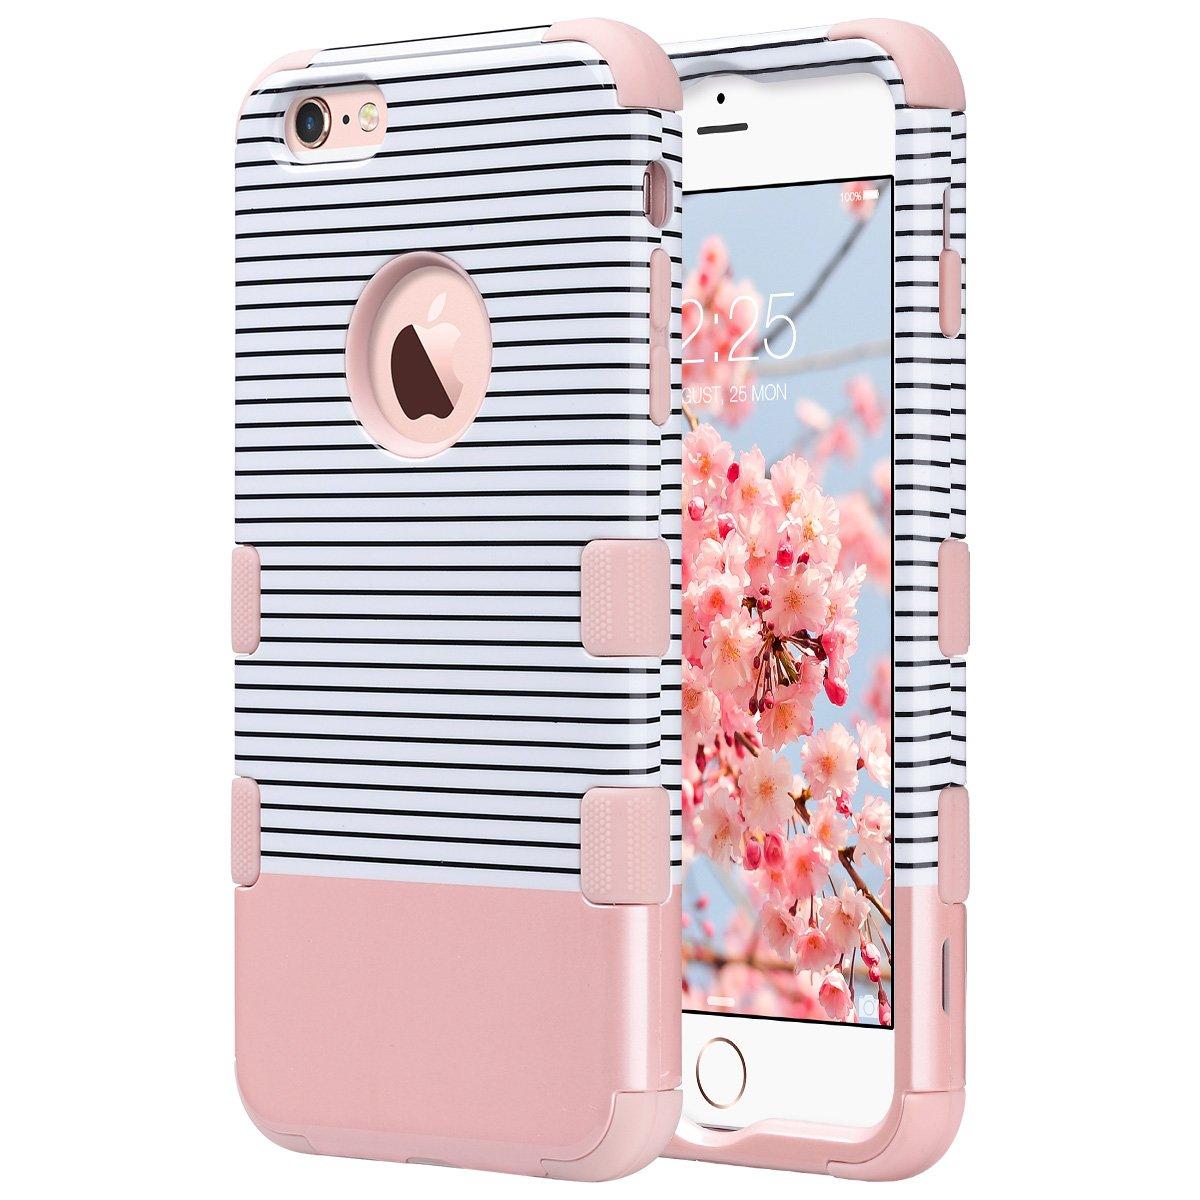 da8a17562ae low-cost Caso del iPhone 6 Plus 5,5 pulgadas, ULAK iPhone 6s Plus Funda  Carcasa ...